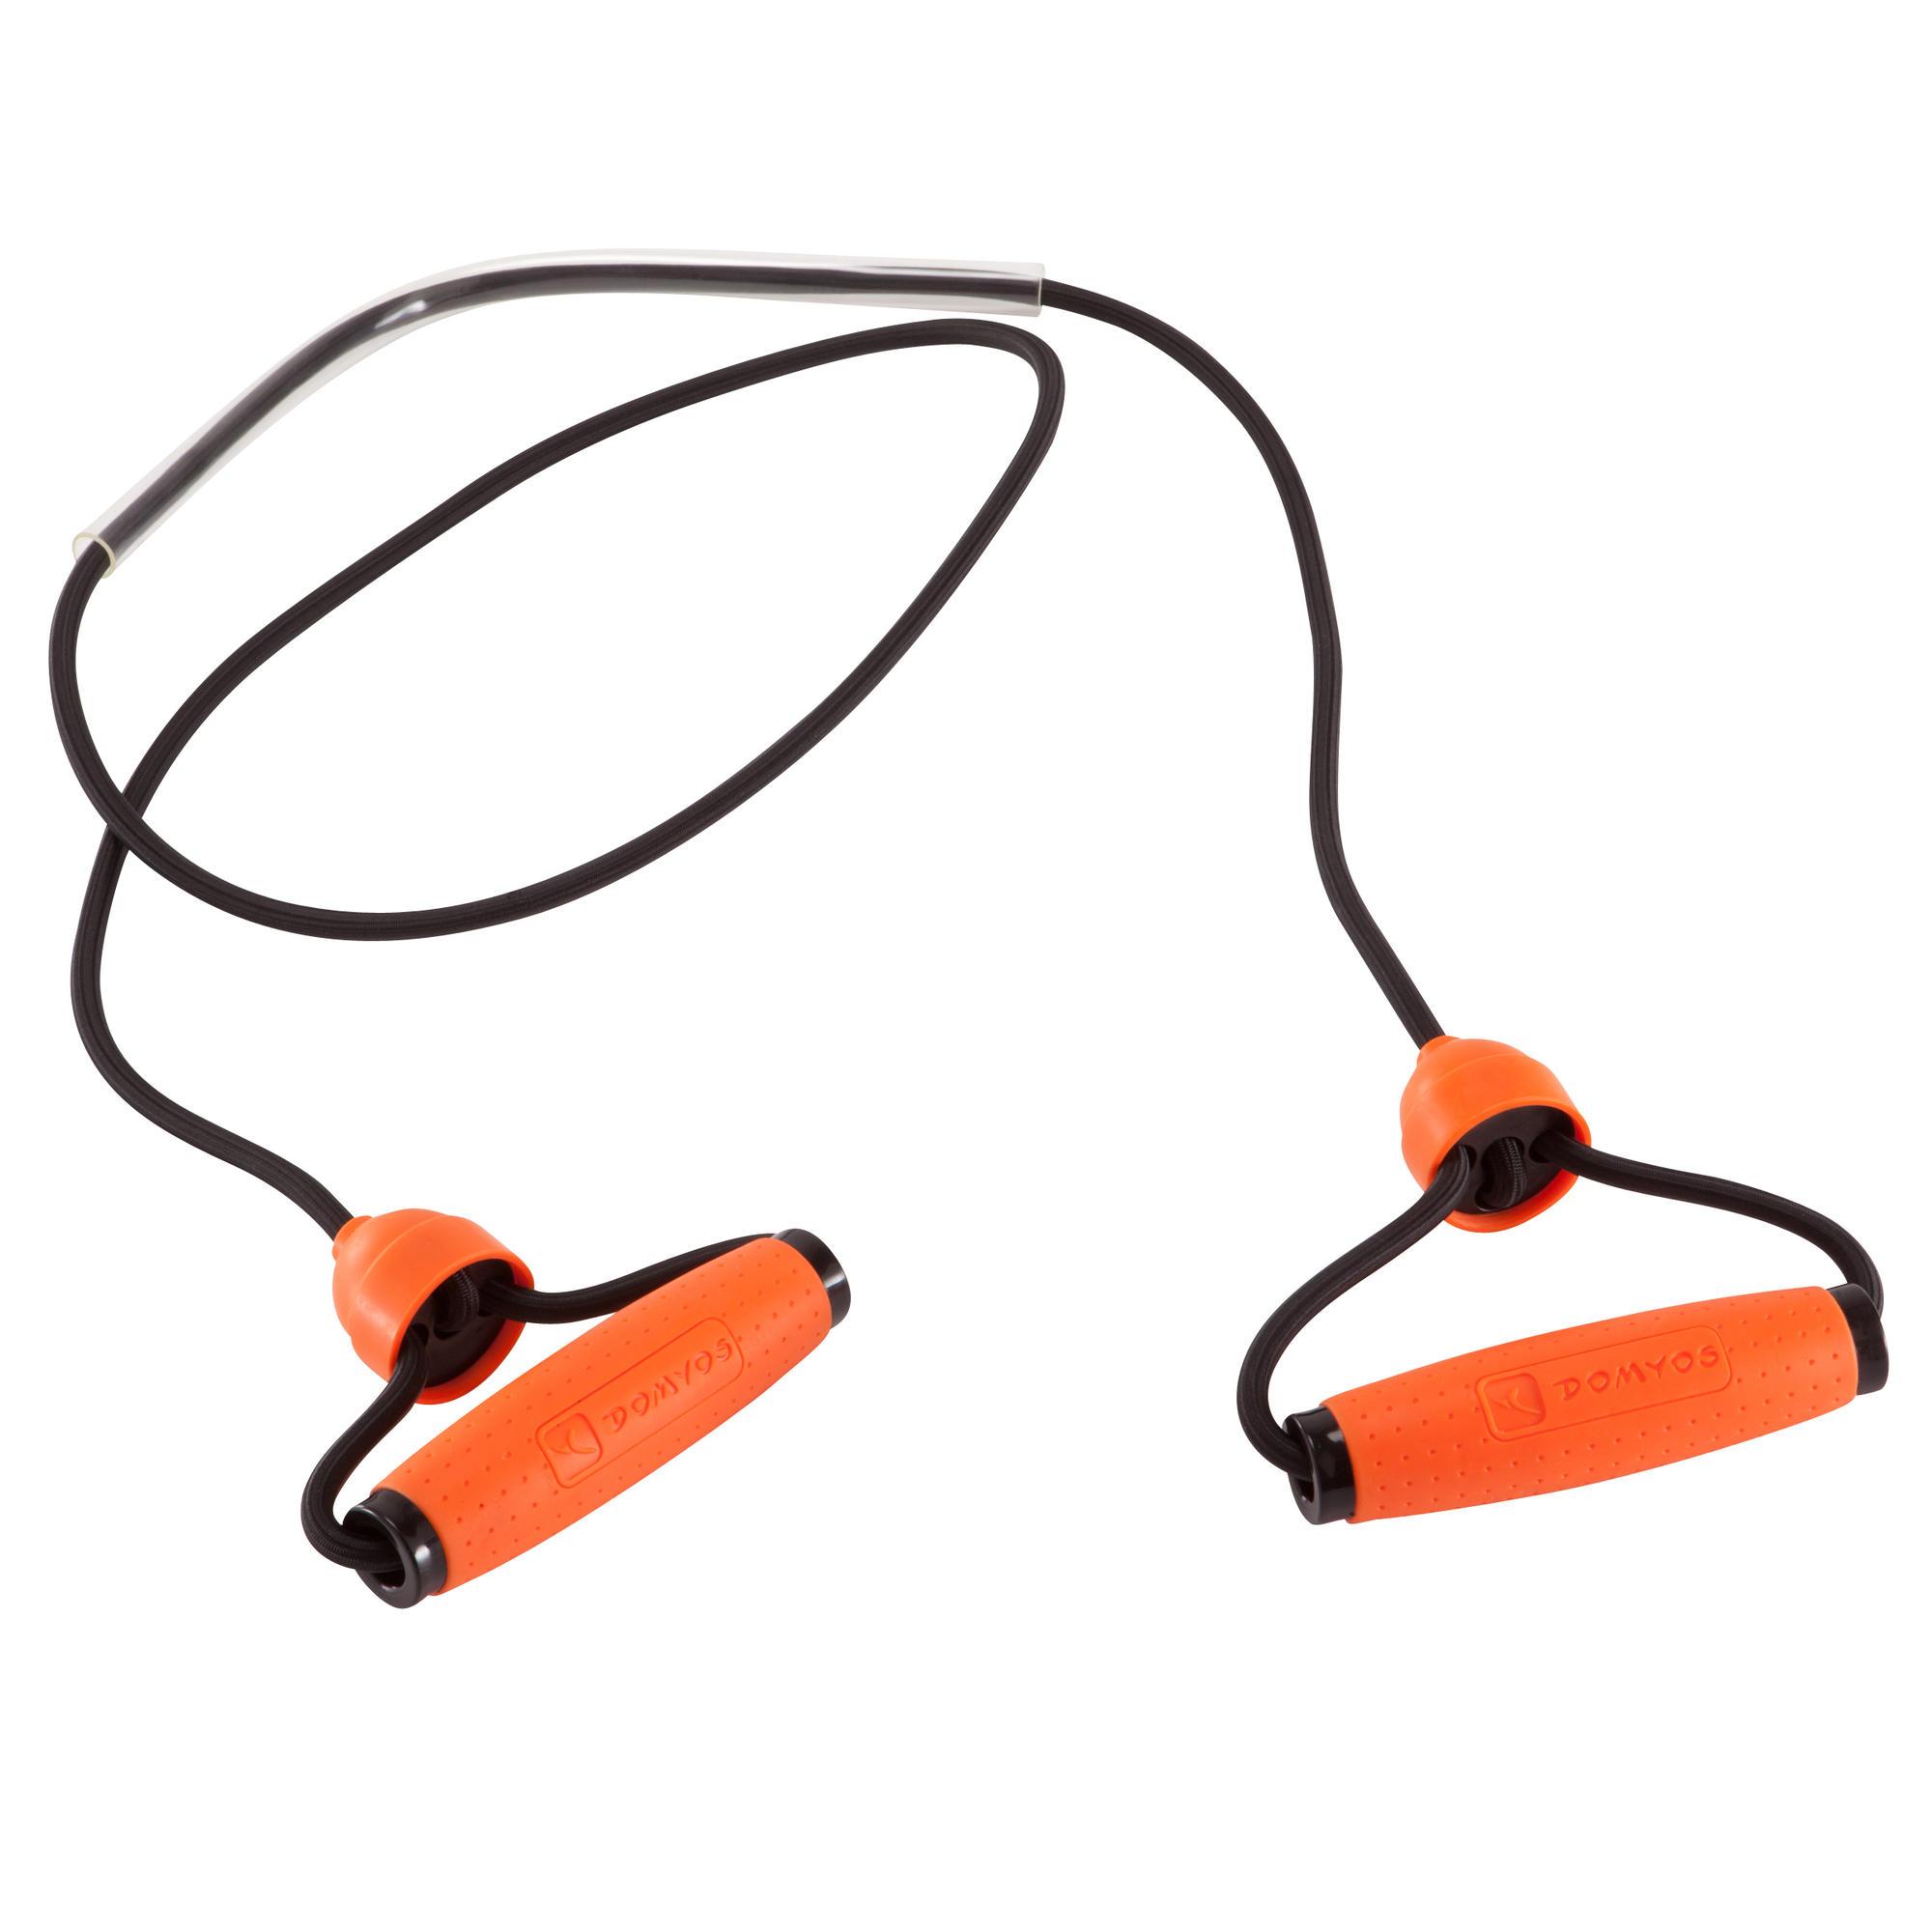 Resistance Bands Uk Decathlon: Adjustable Toning Gym Elastic Band Level Hard